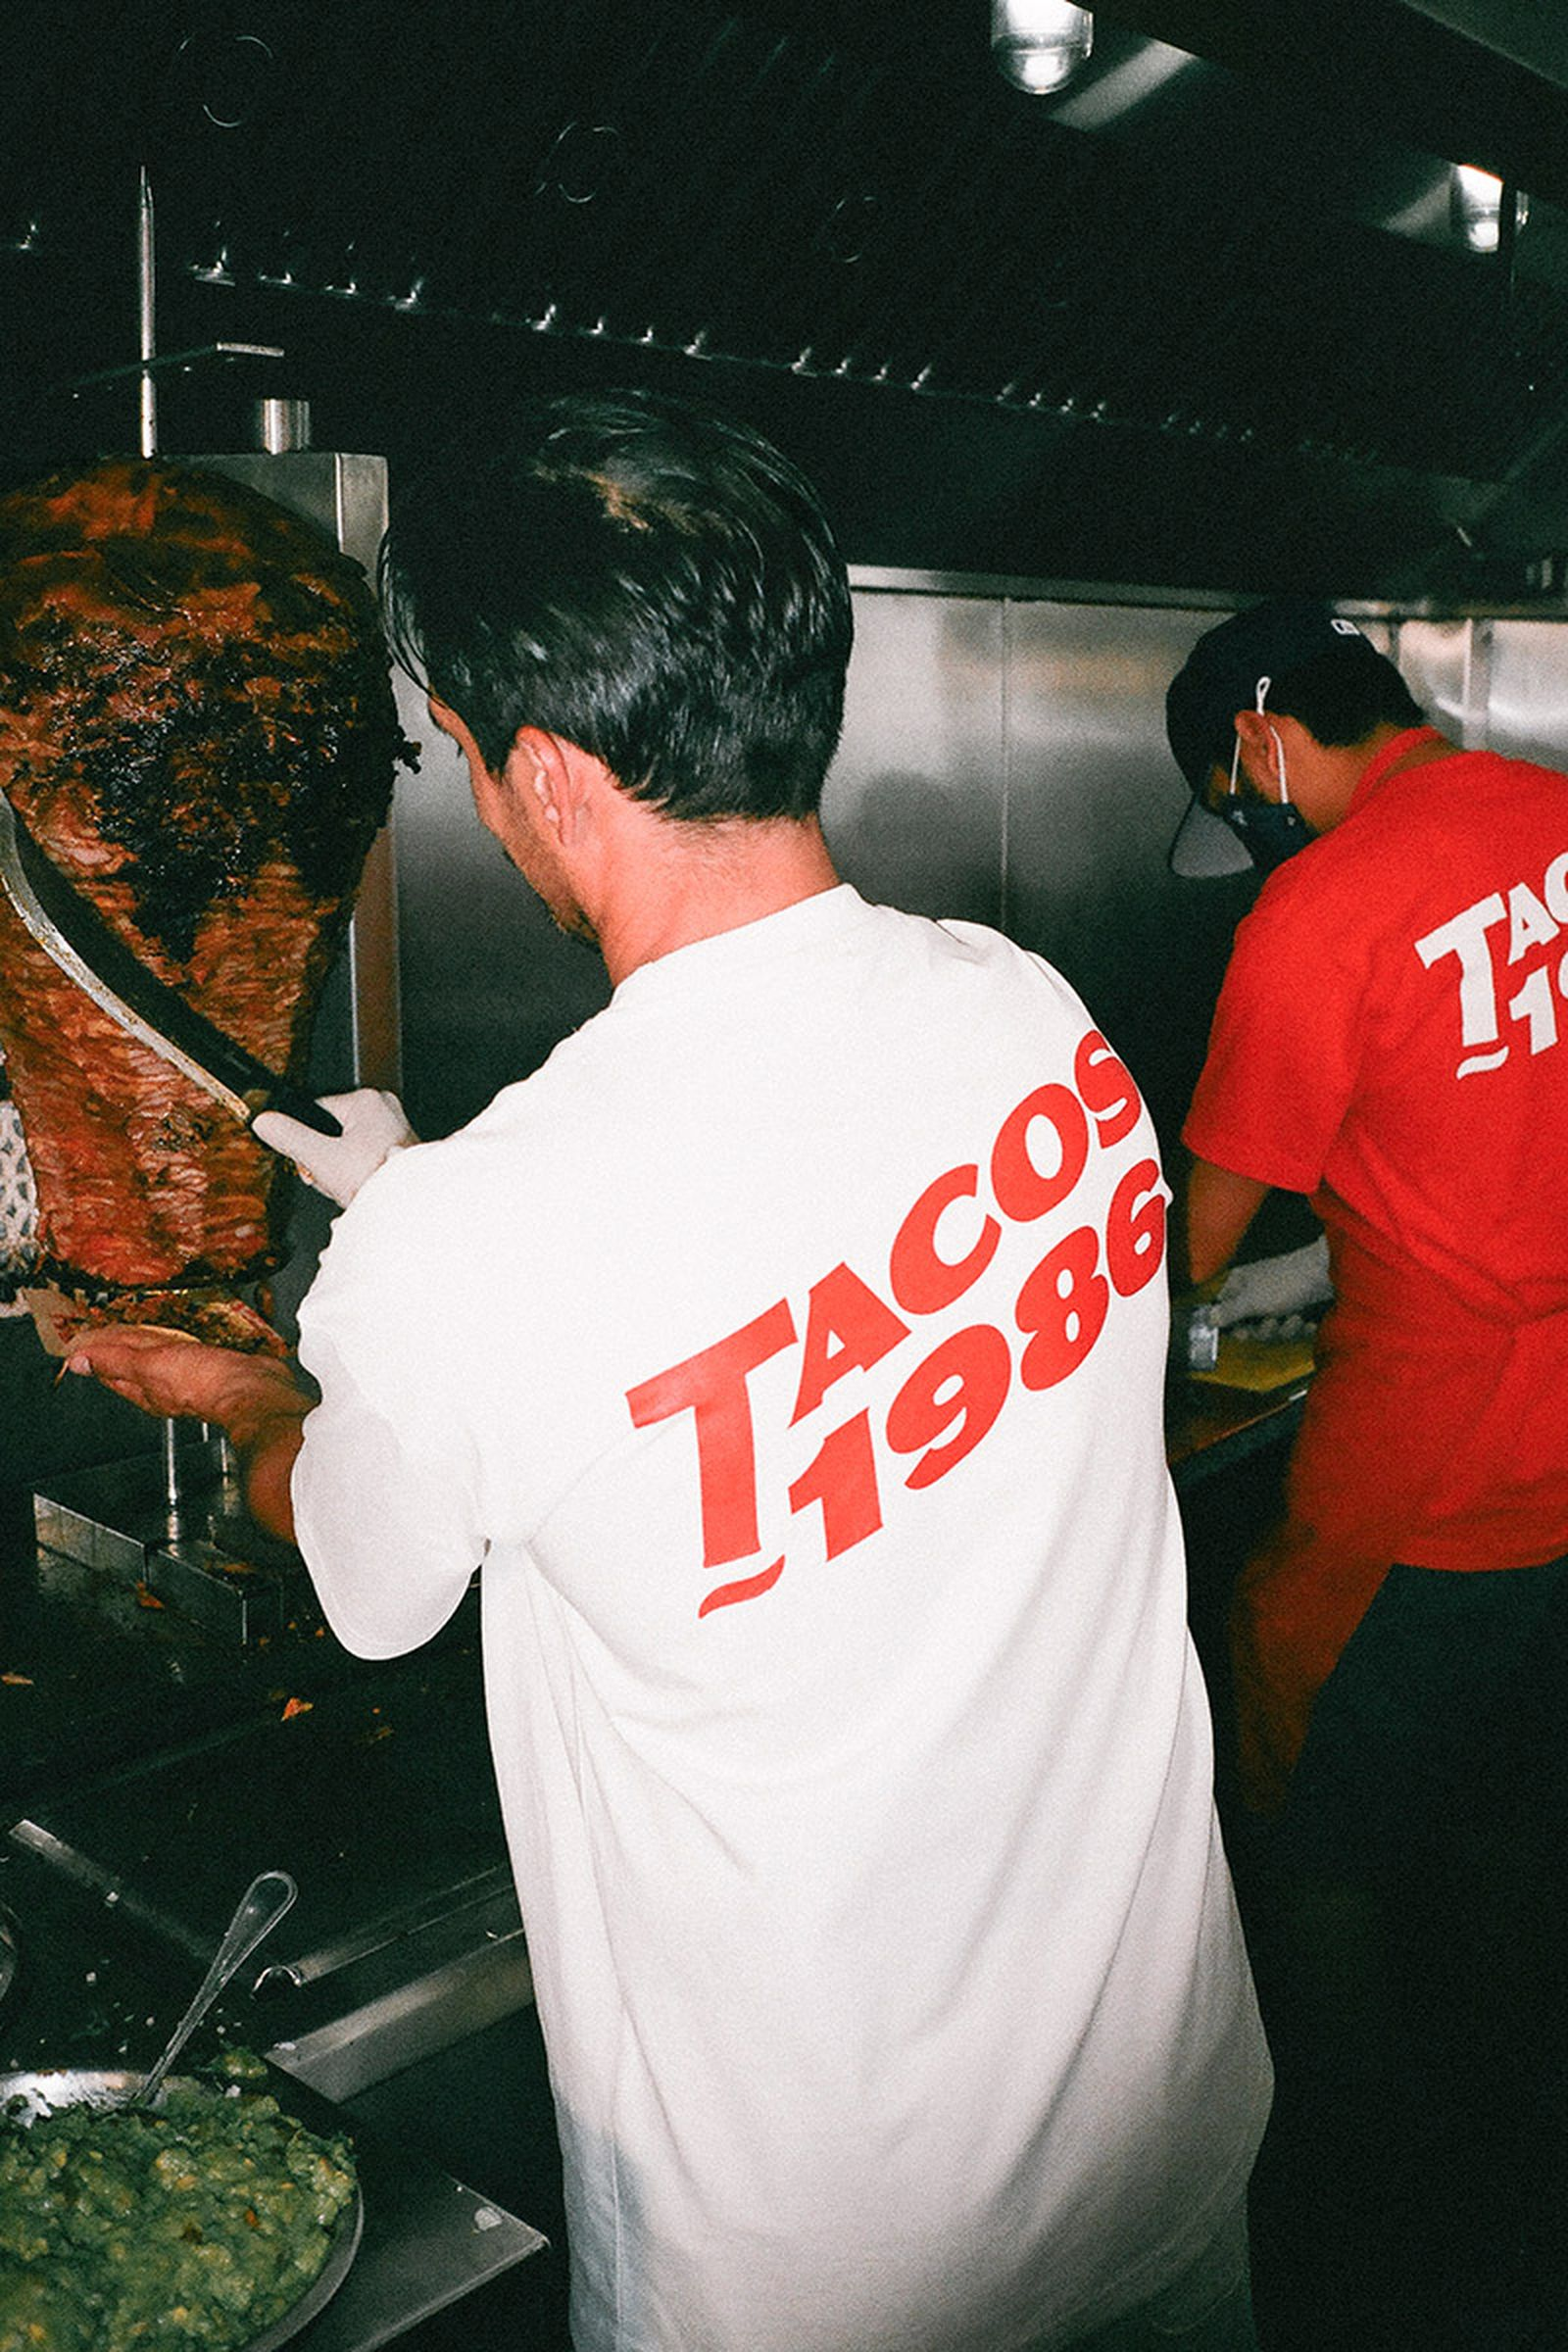 tacos-1986-x-hm-blank-staples-010